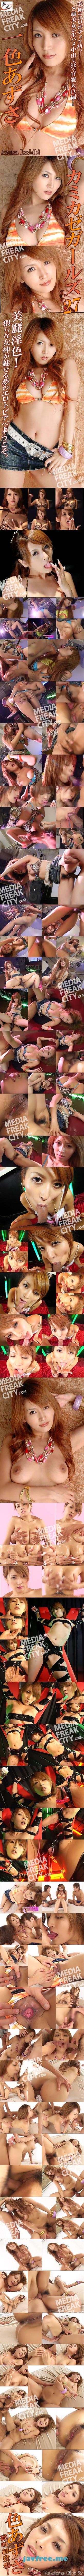 [KG-27] Kamikaze Girls Vol.27 : Azusa Isshiki - image KG27s on https://javfree.me